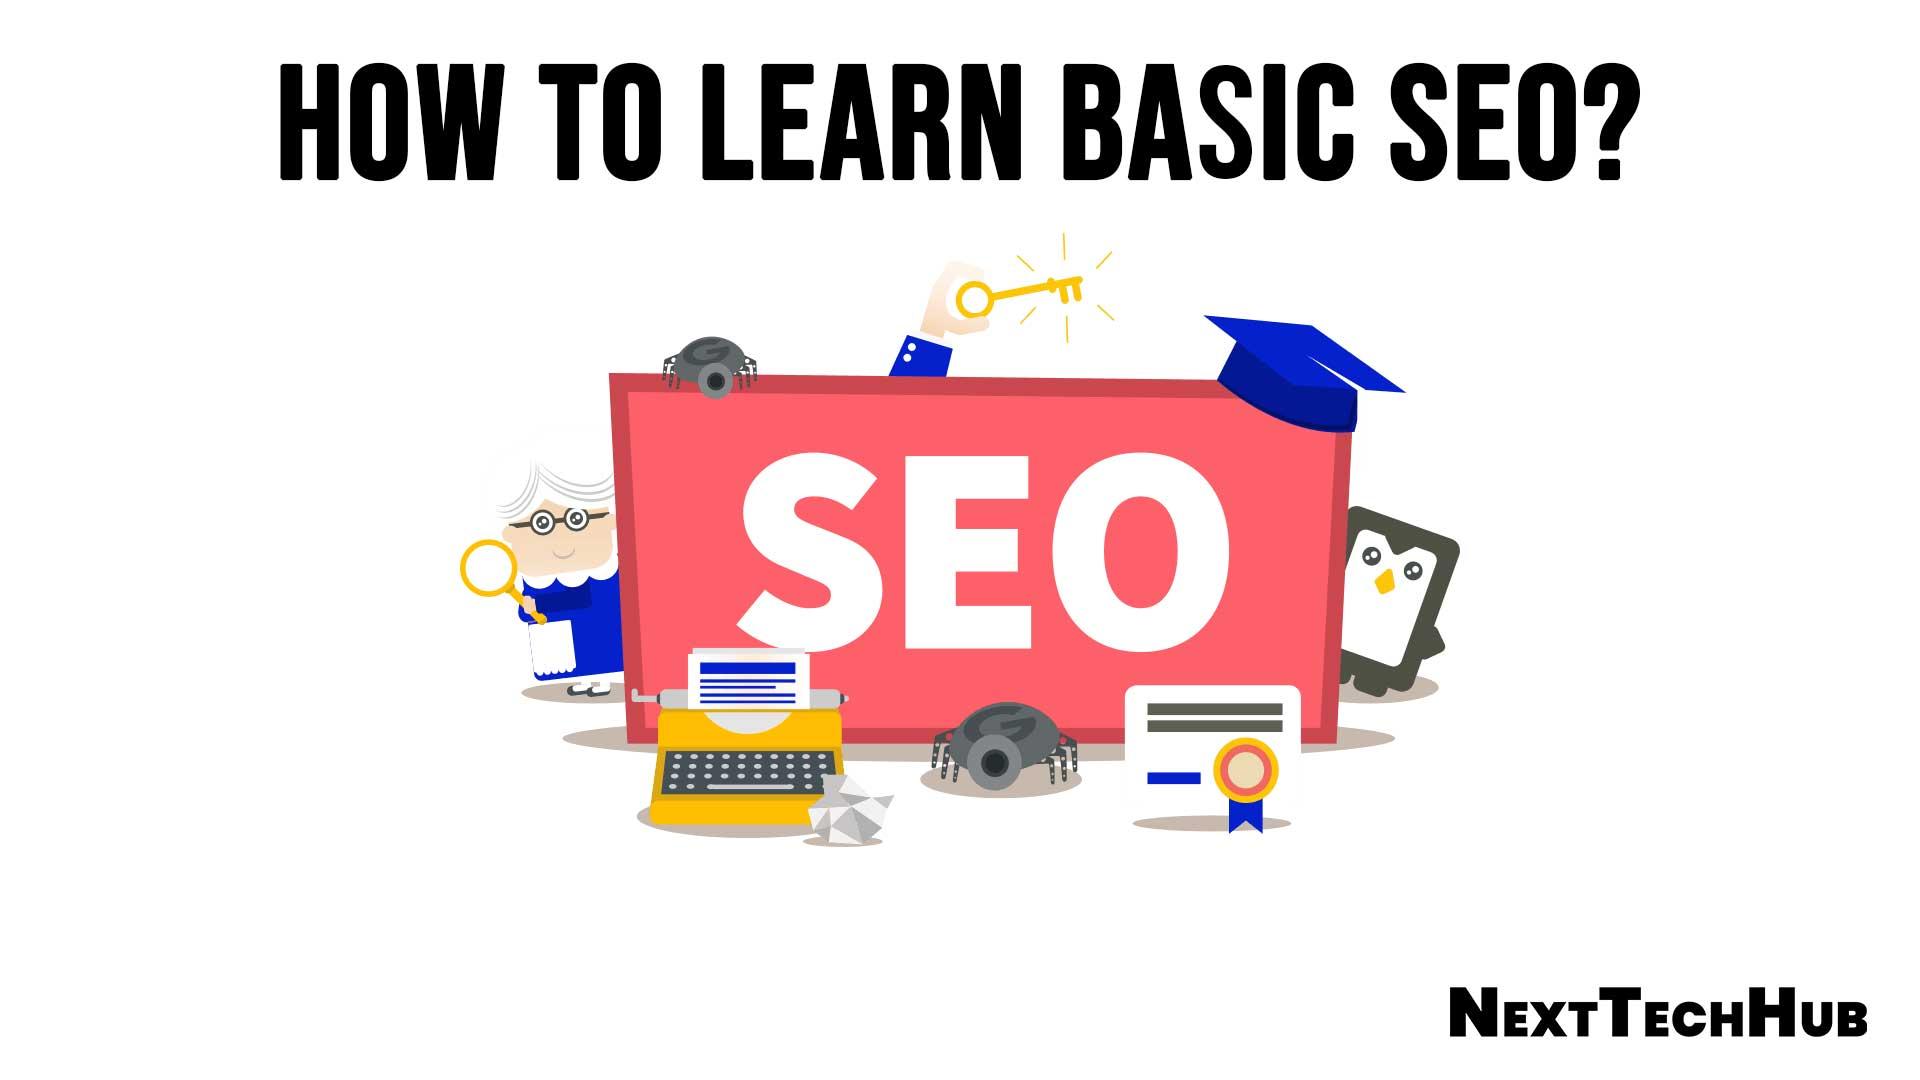 How to learn basic SEO